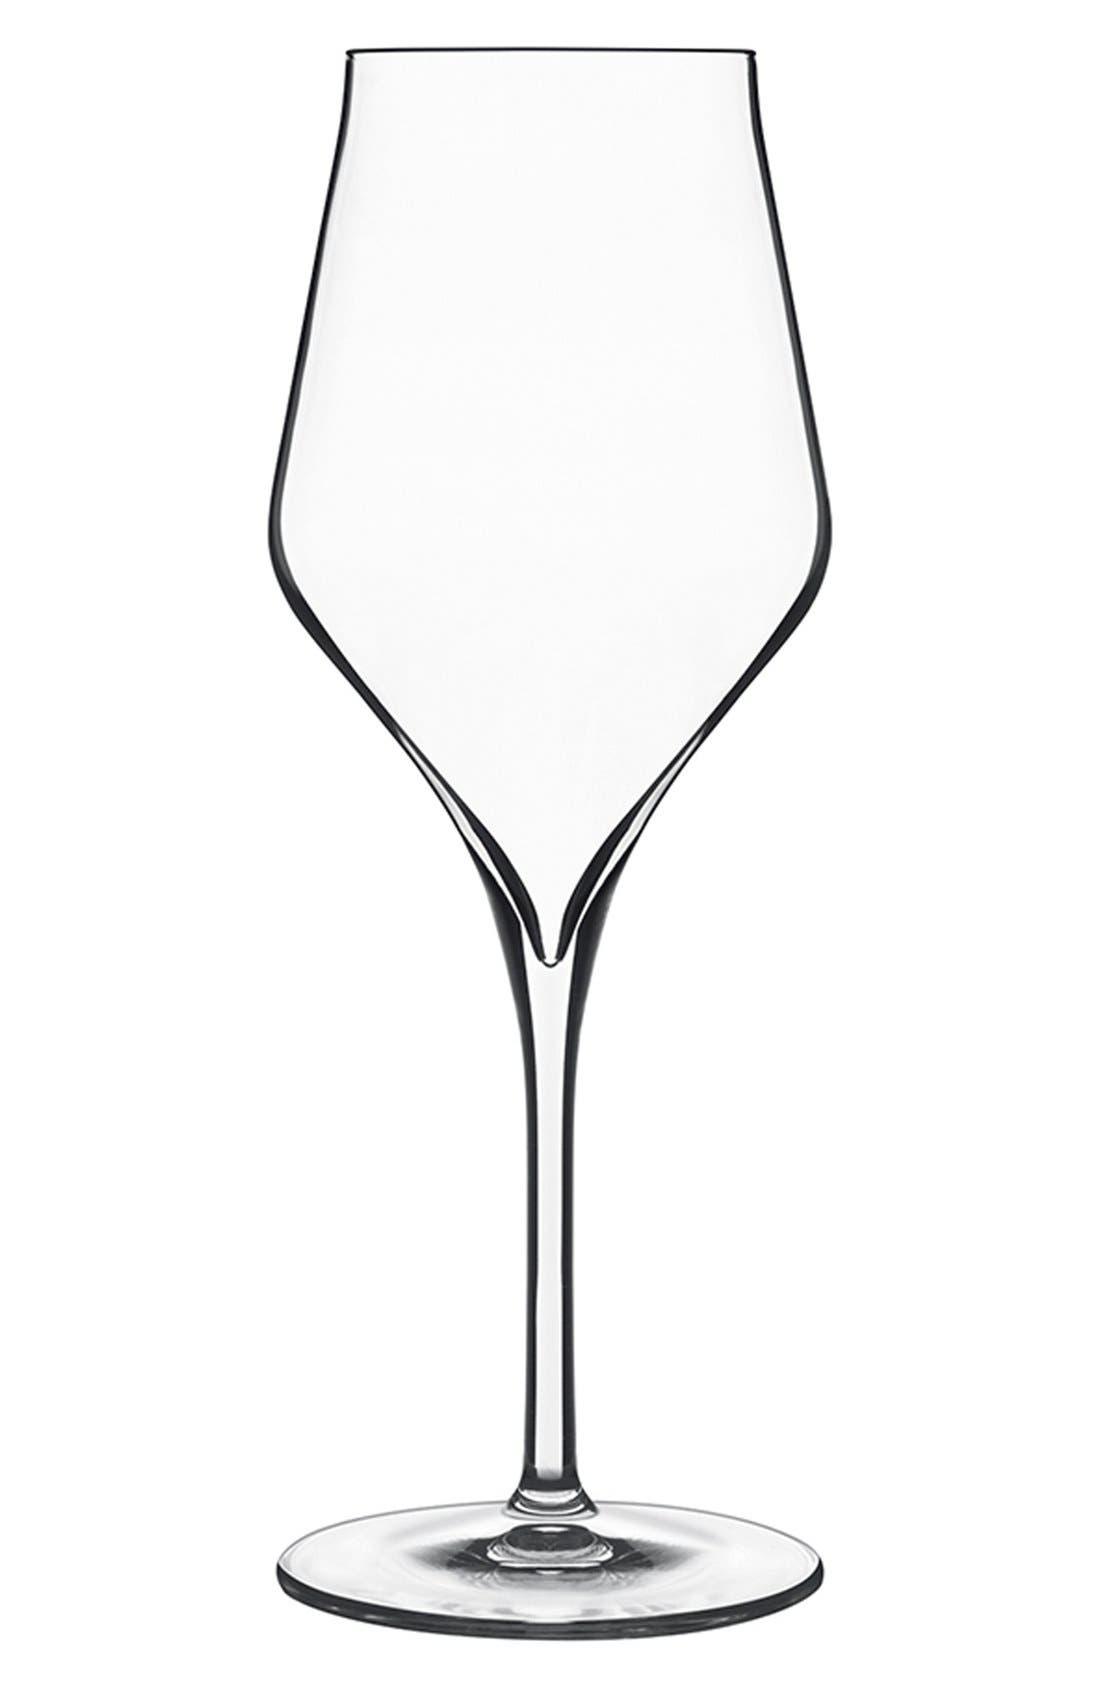 Main Image - Luigi Bormioli 'Supremo' Chardonnay Glasses (Set of 6)